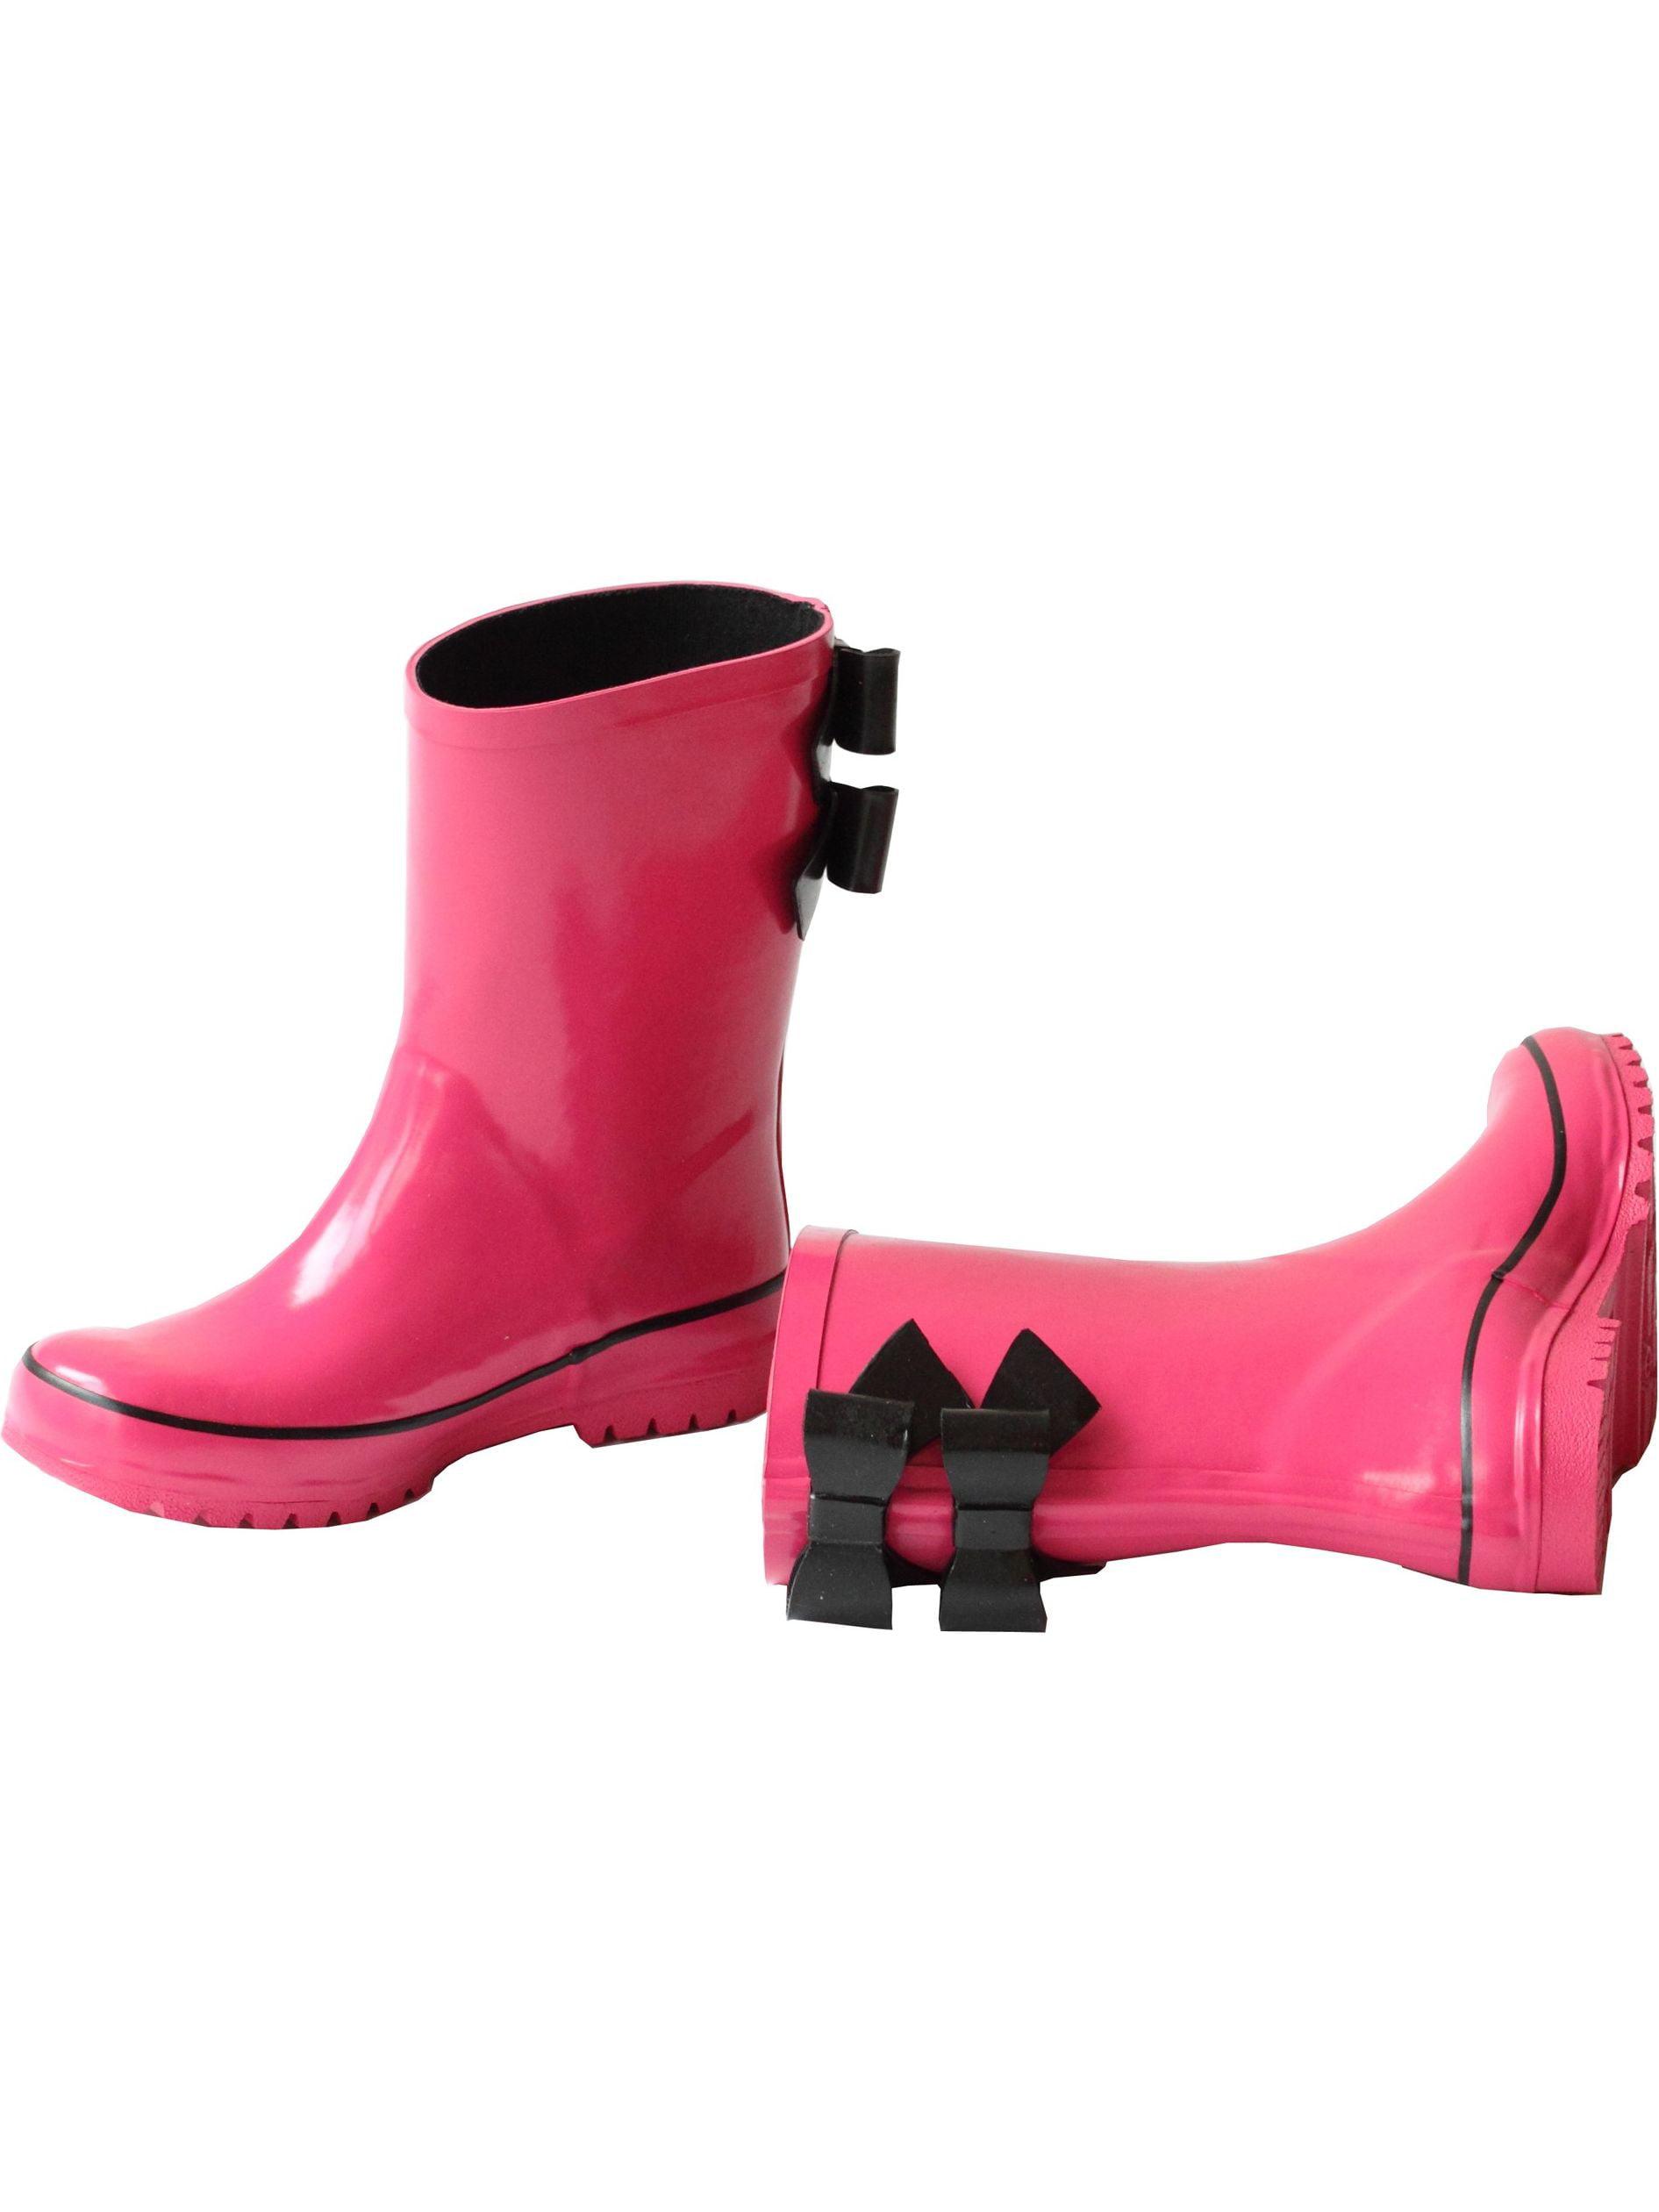 Pluie Pluie Girls Rain Fuchsia Black Double Bow Rain Girls Boots 5-10 Toddler d6406c